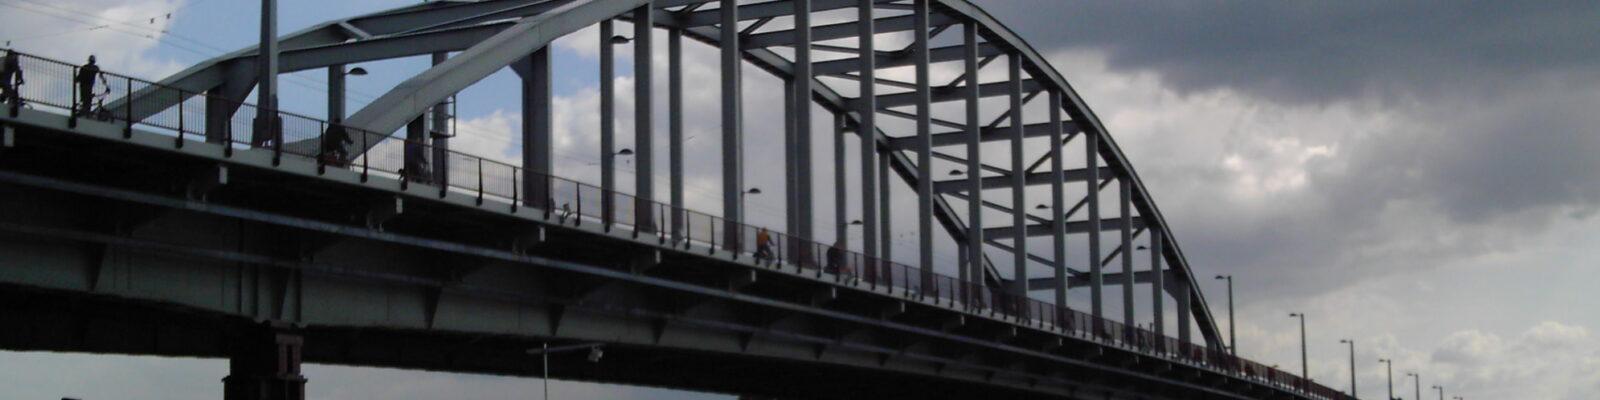 Arnhem - John Frost Bridge (Image Copyright: Stephen Berridge)